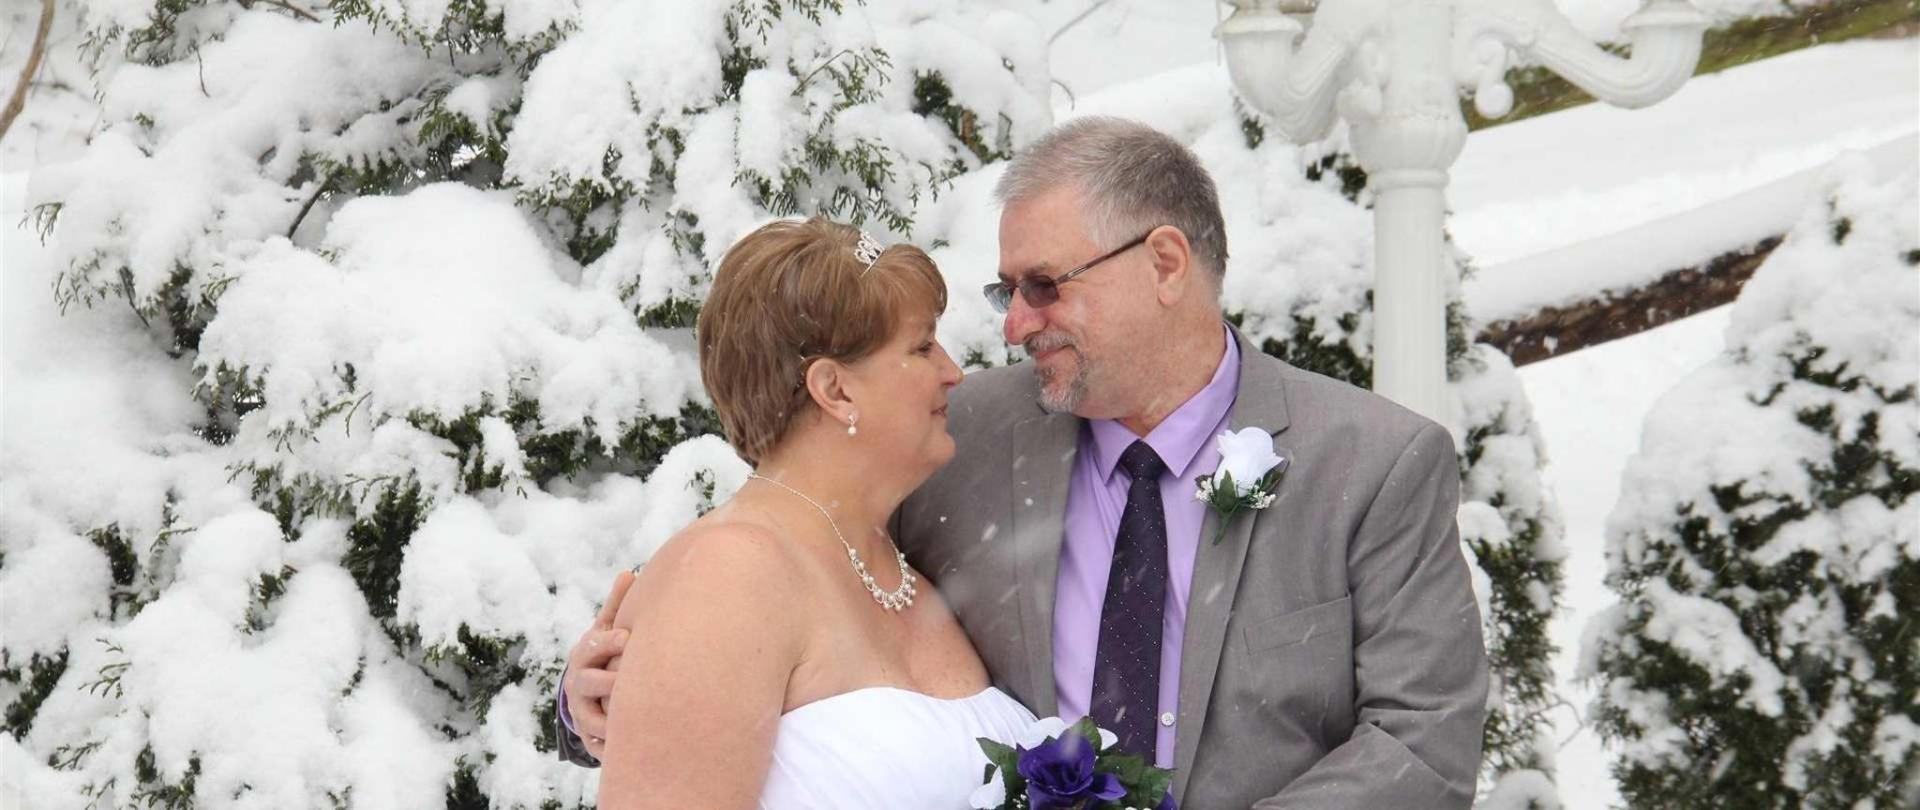 cupid-s-couple-in-the-snow-01.jpg.1920x810_0_57_10000.jpeg.1920x0.jpeg